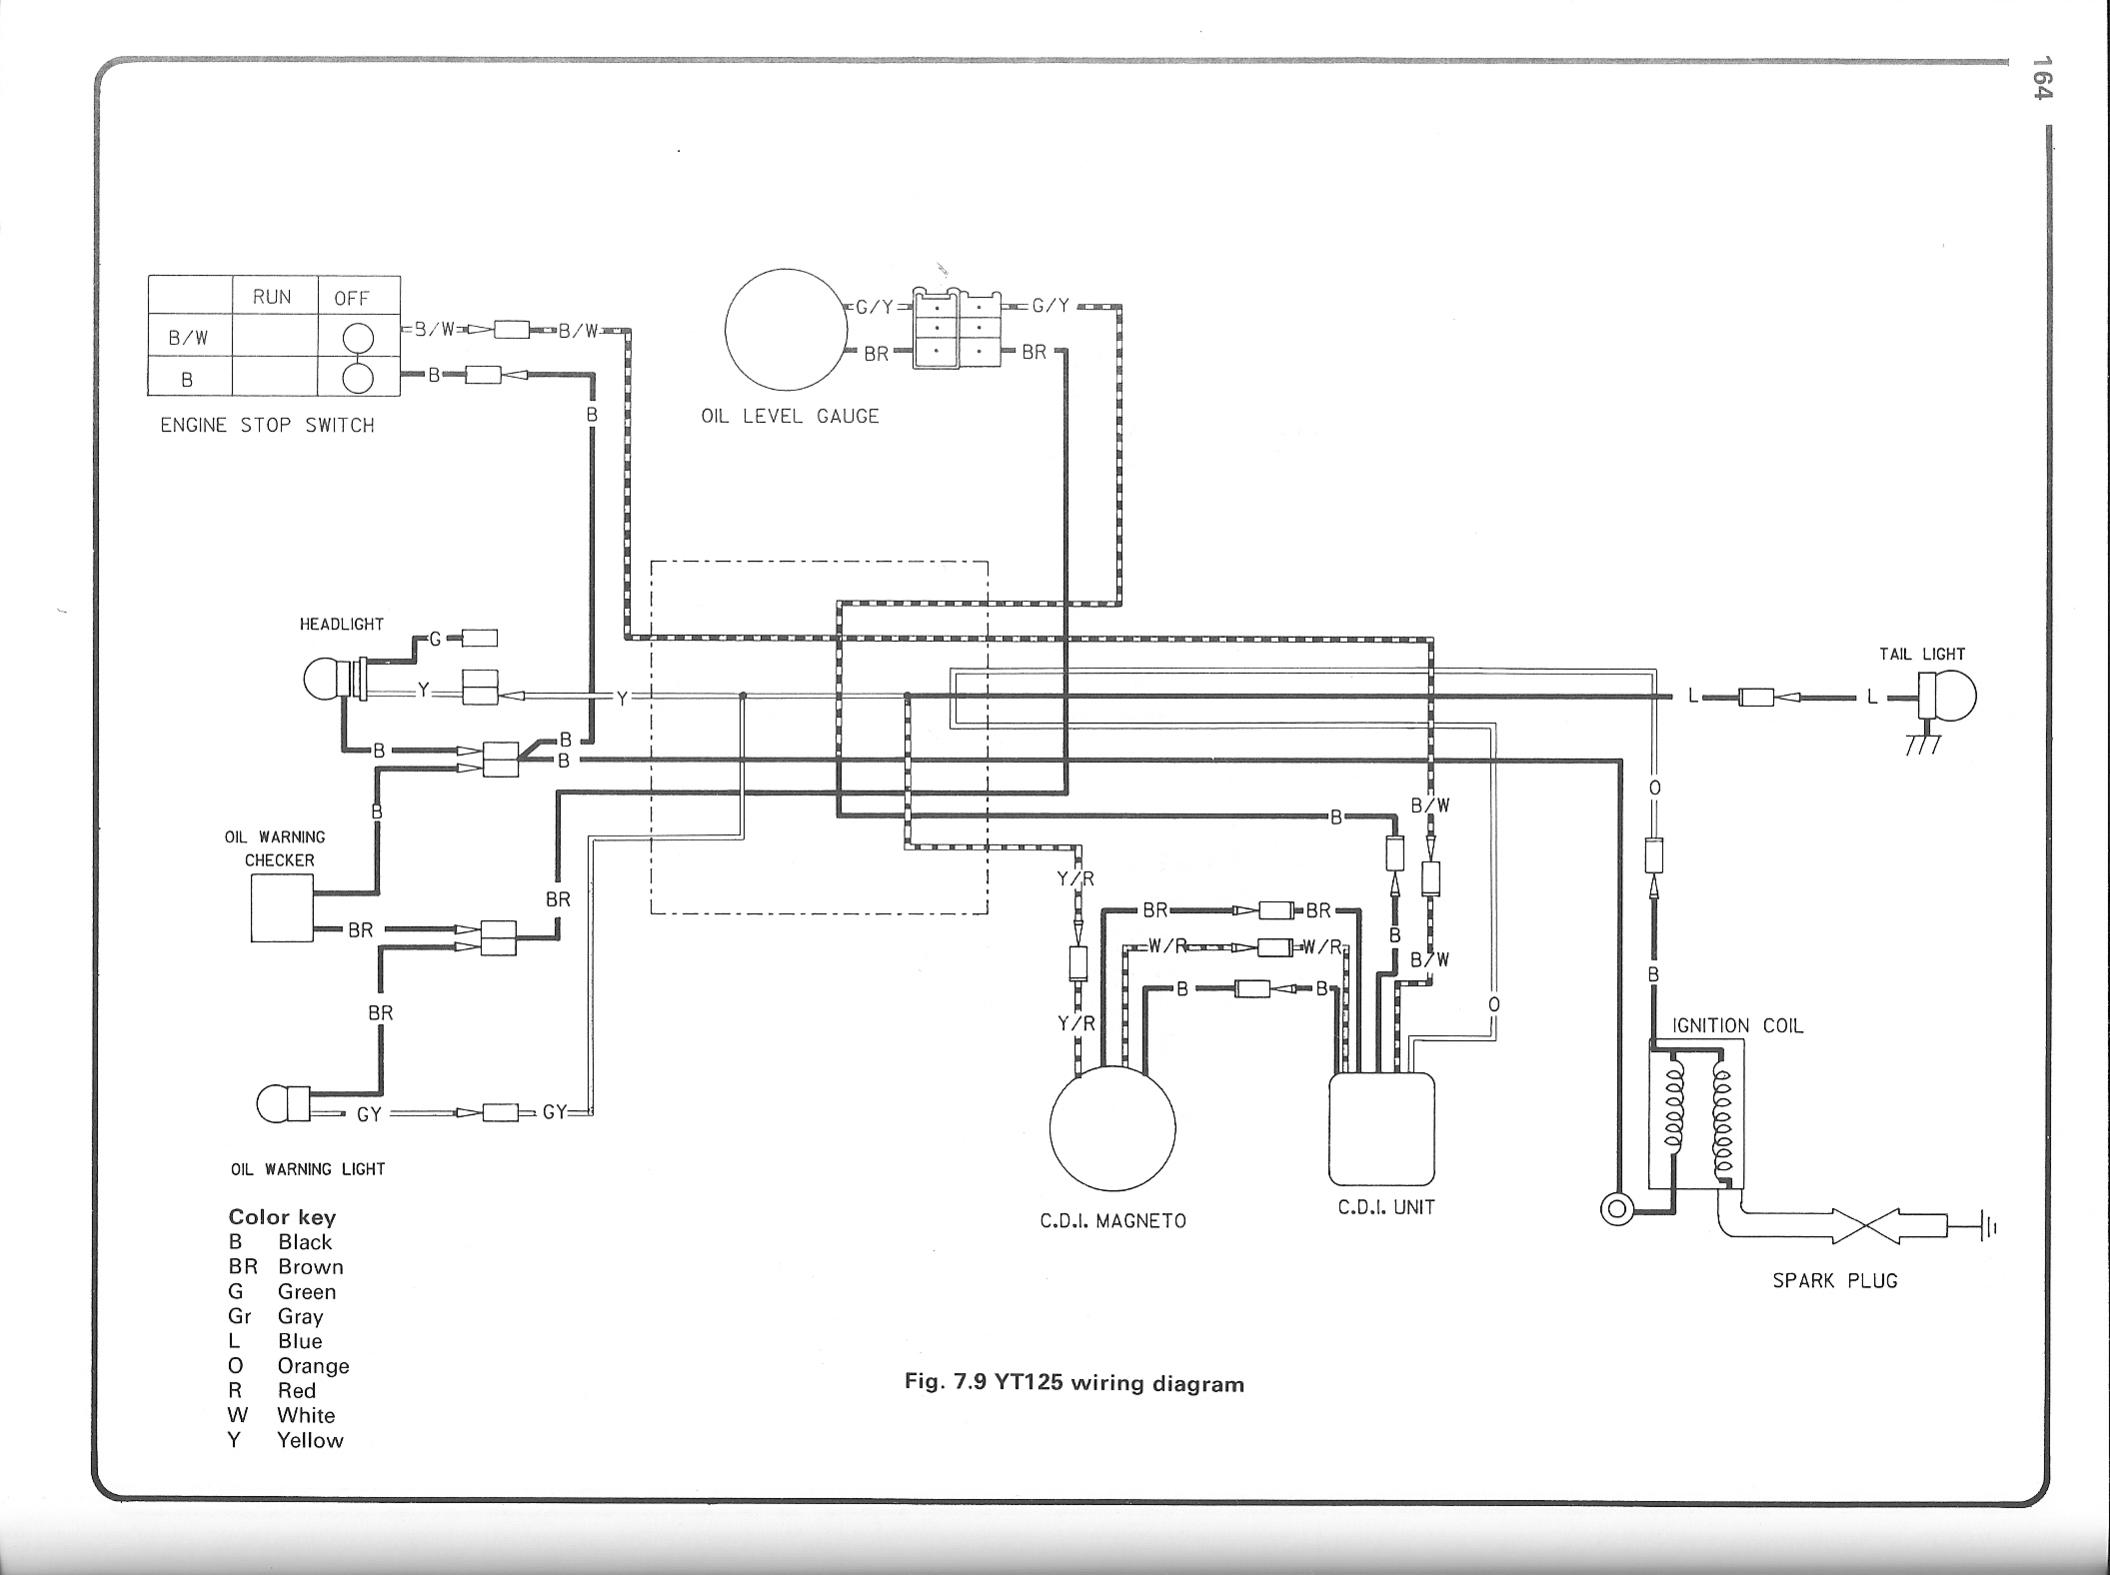 banshee wiring diagram diagram for 05 chrysler pacifica engine, Wiring diagram